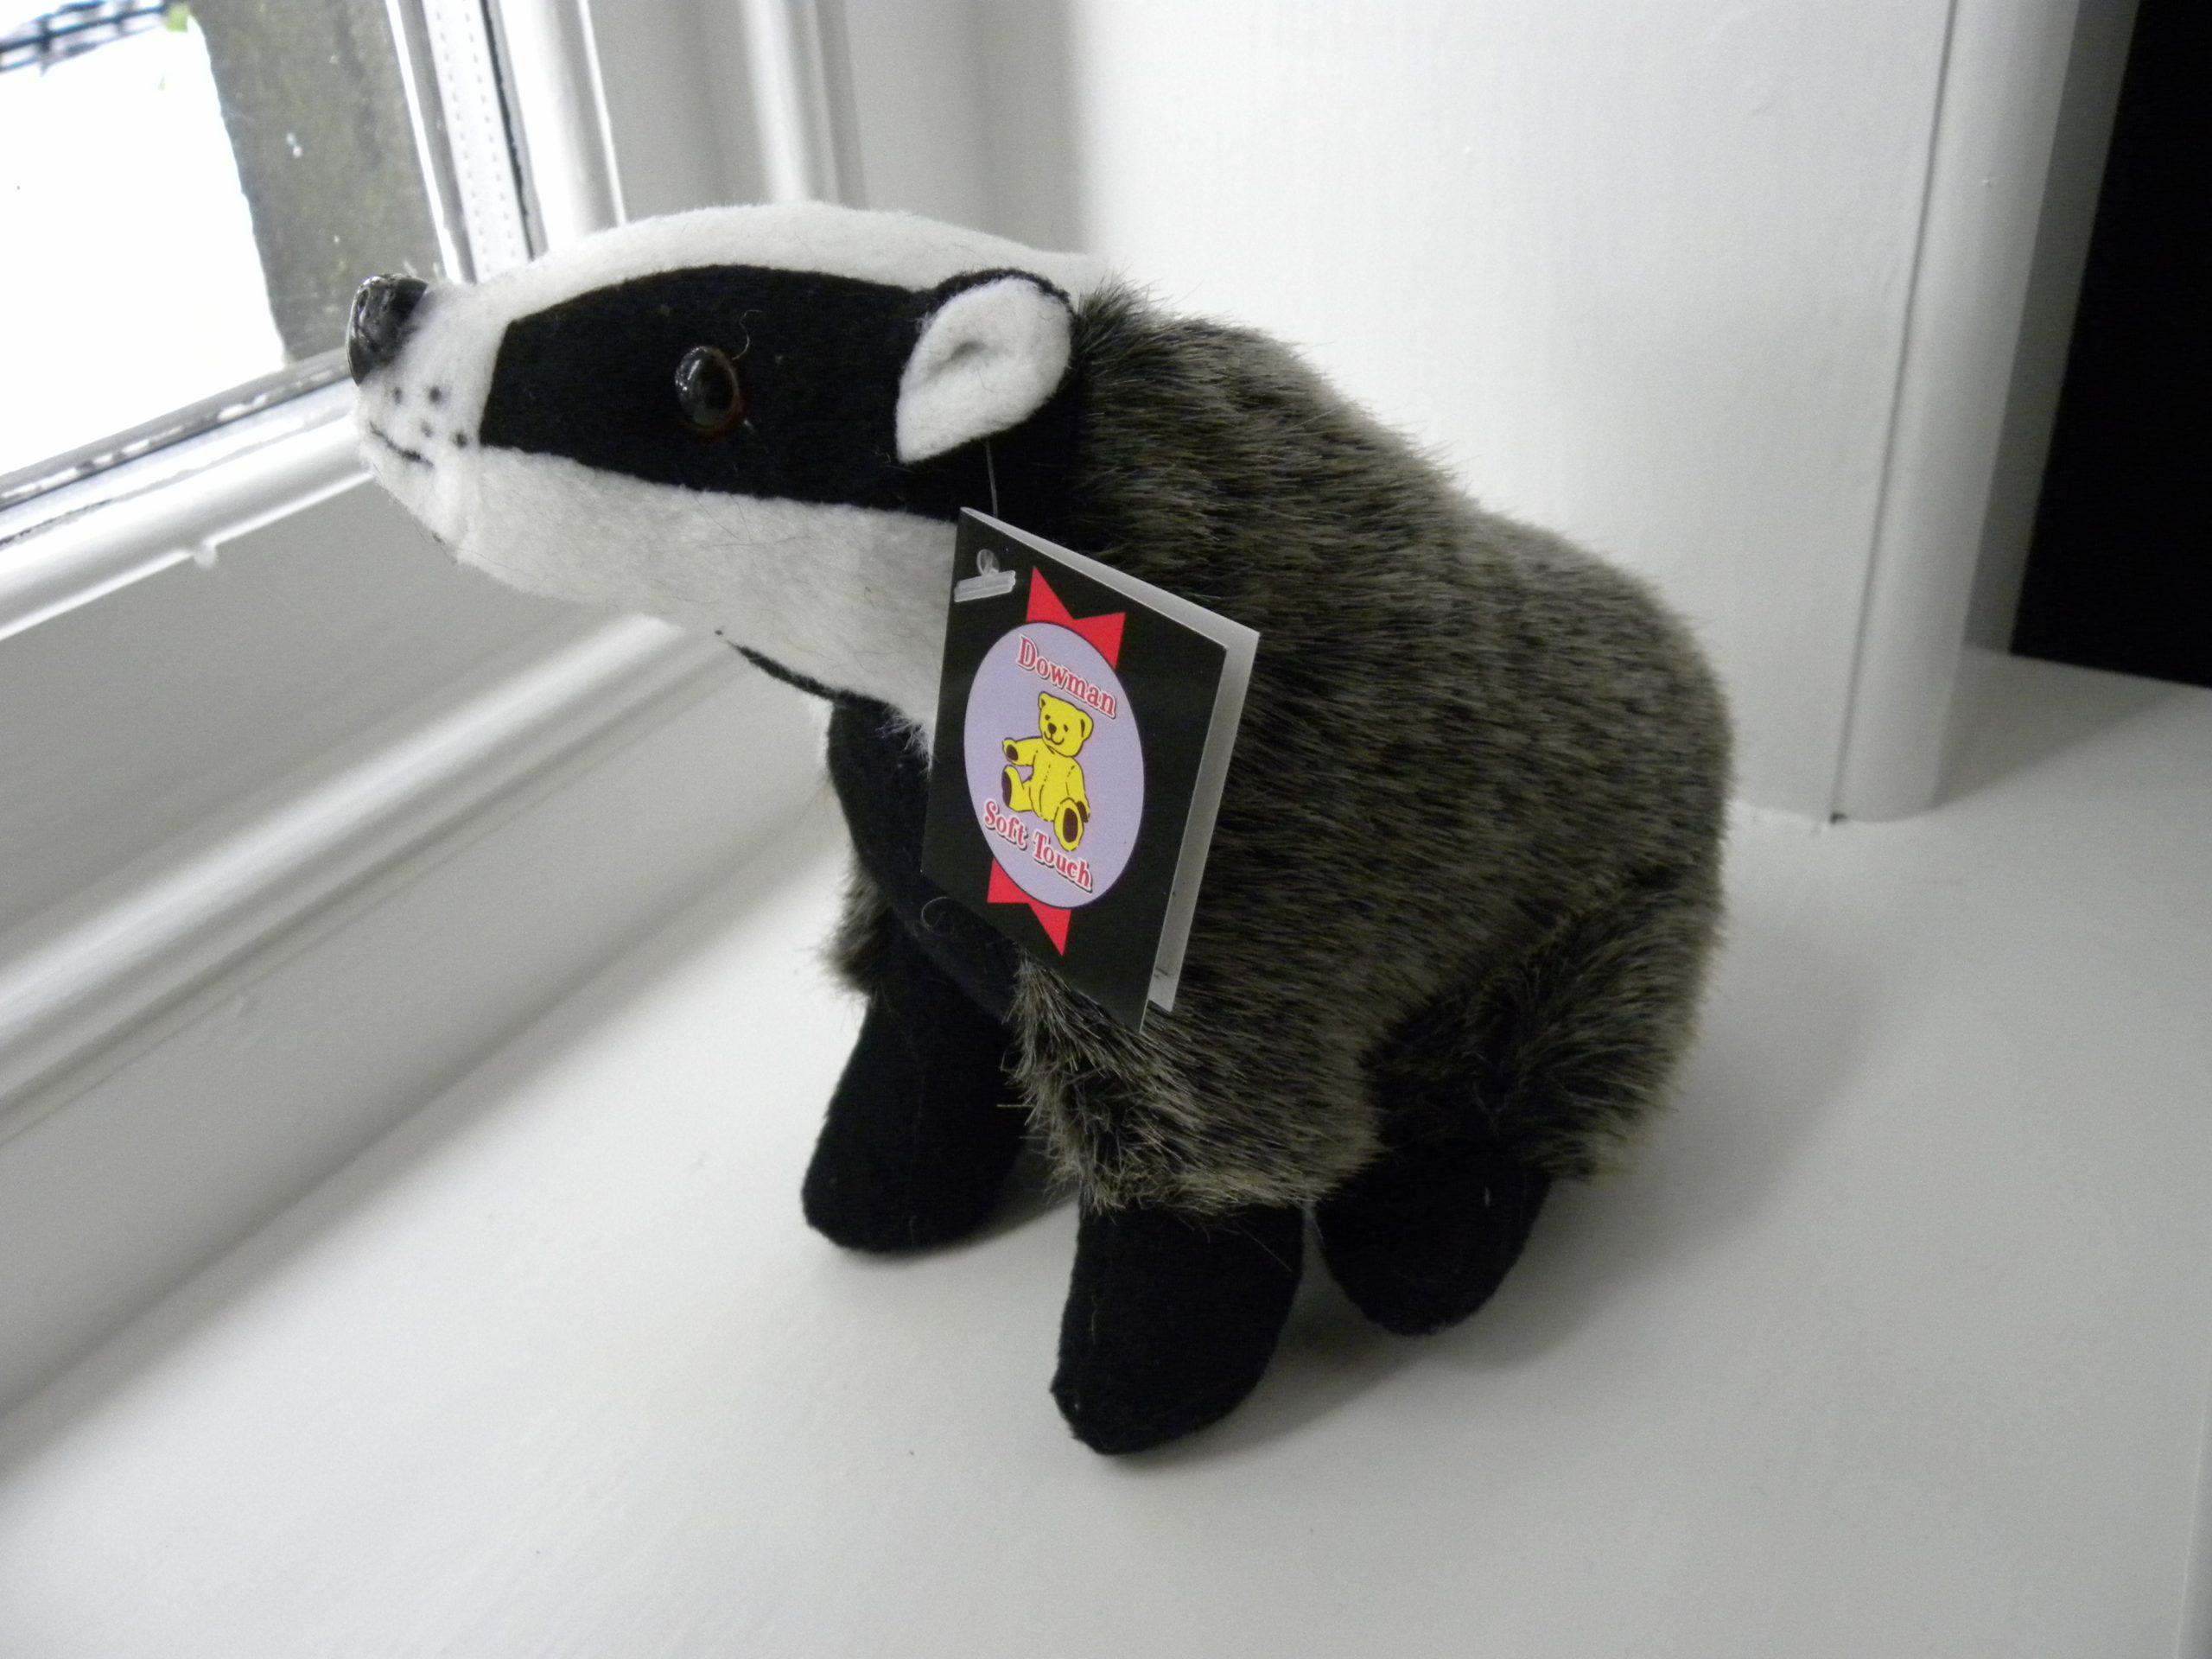 Medium Plush Sitting Badger Toy Teddy - 23cm